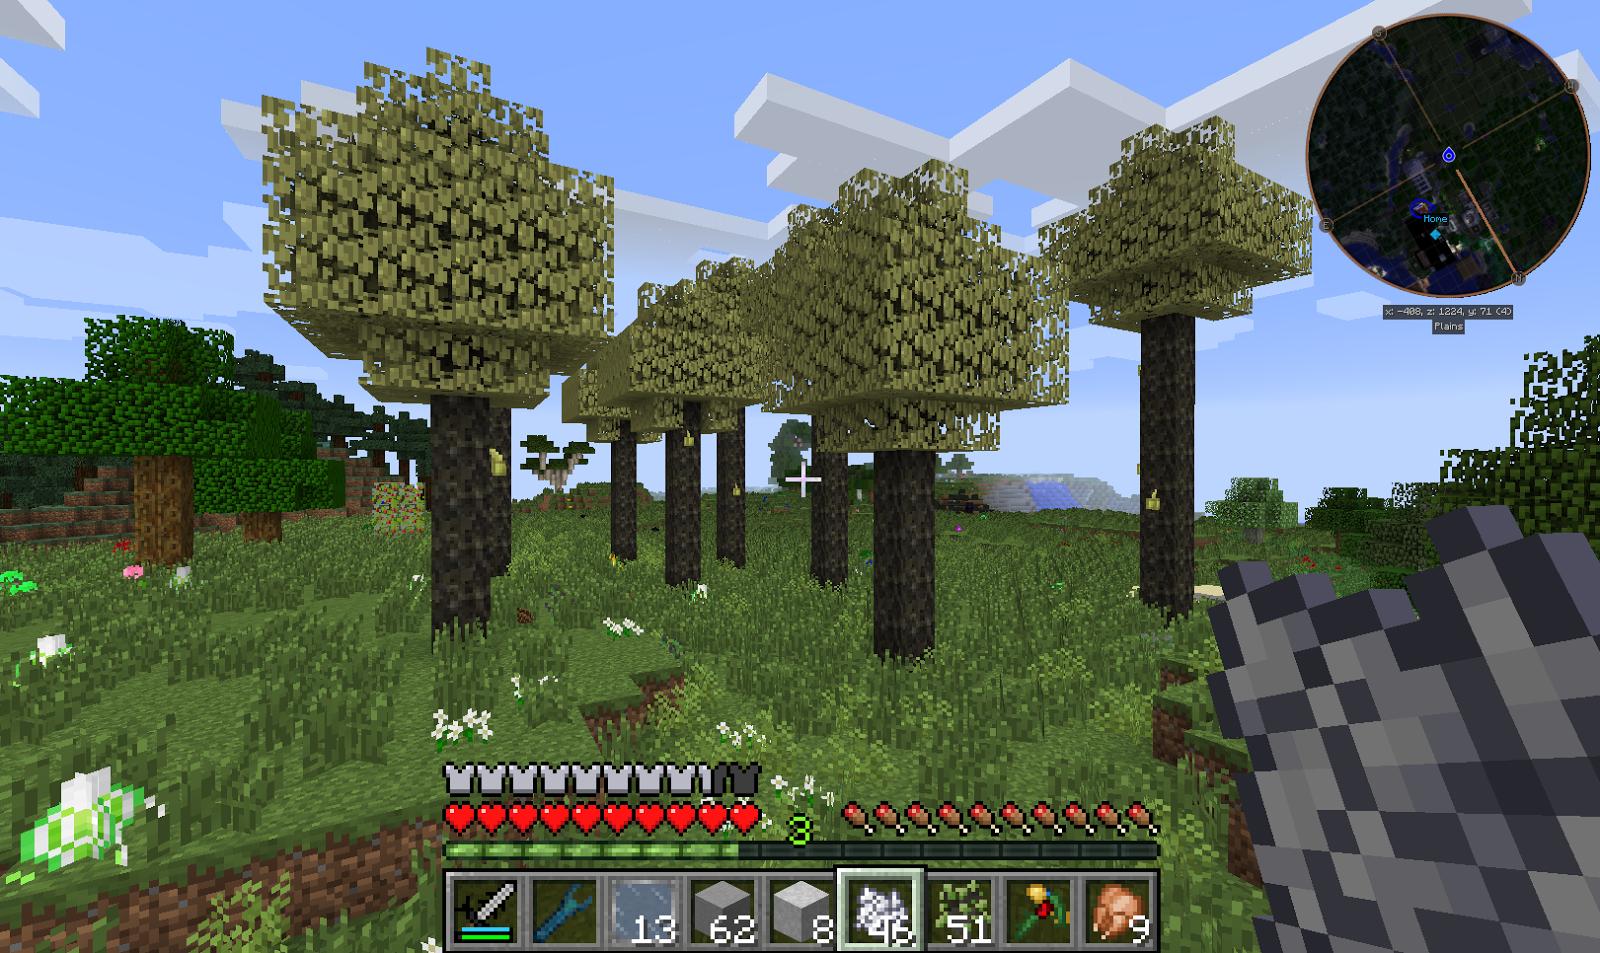 Modjo Minecraft: 2014